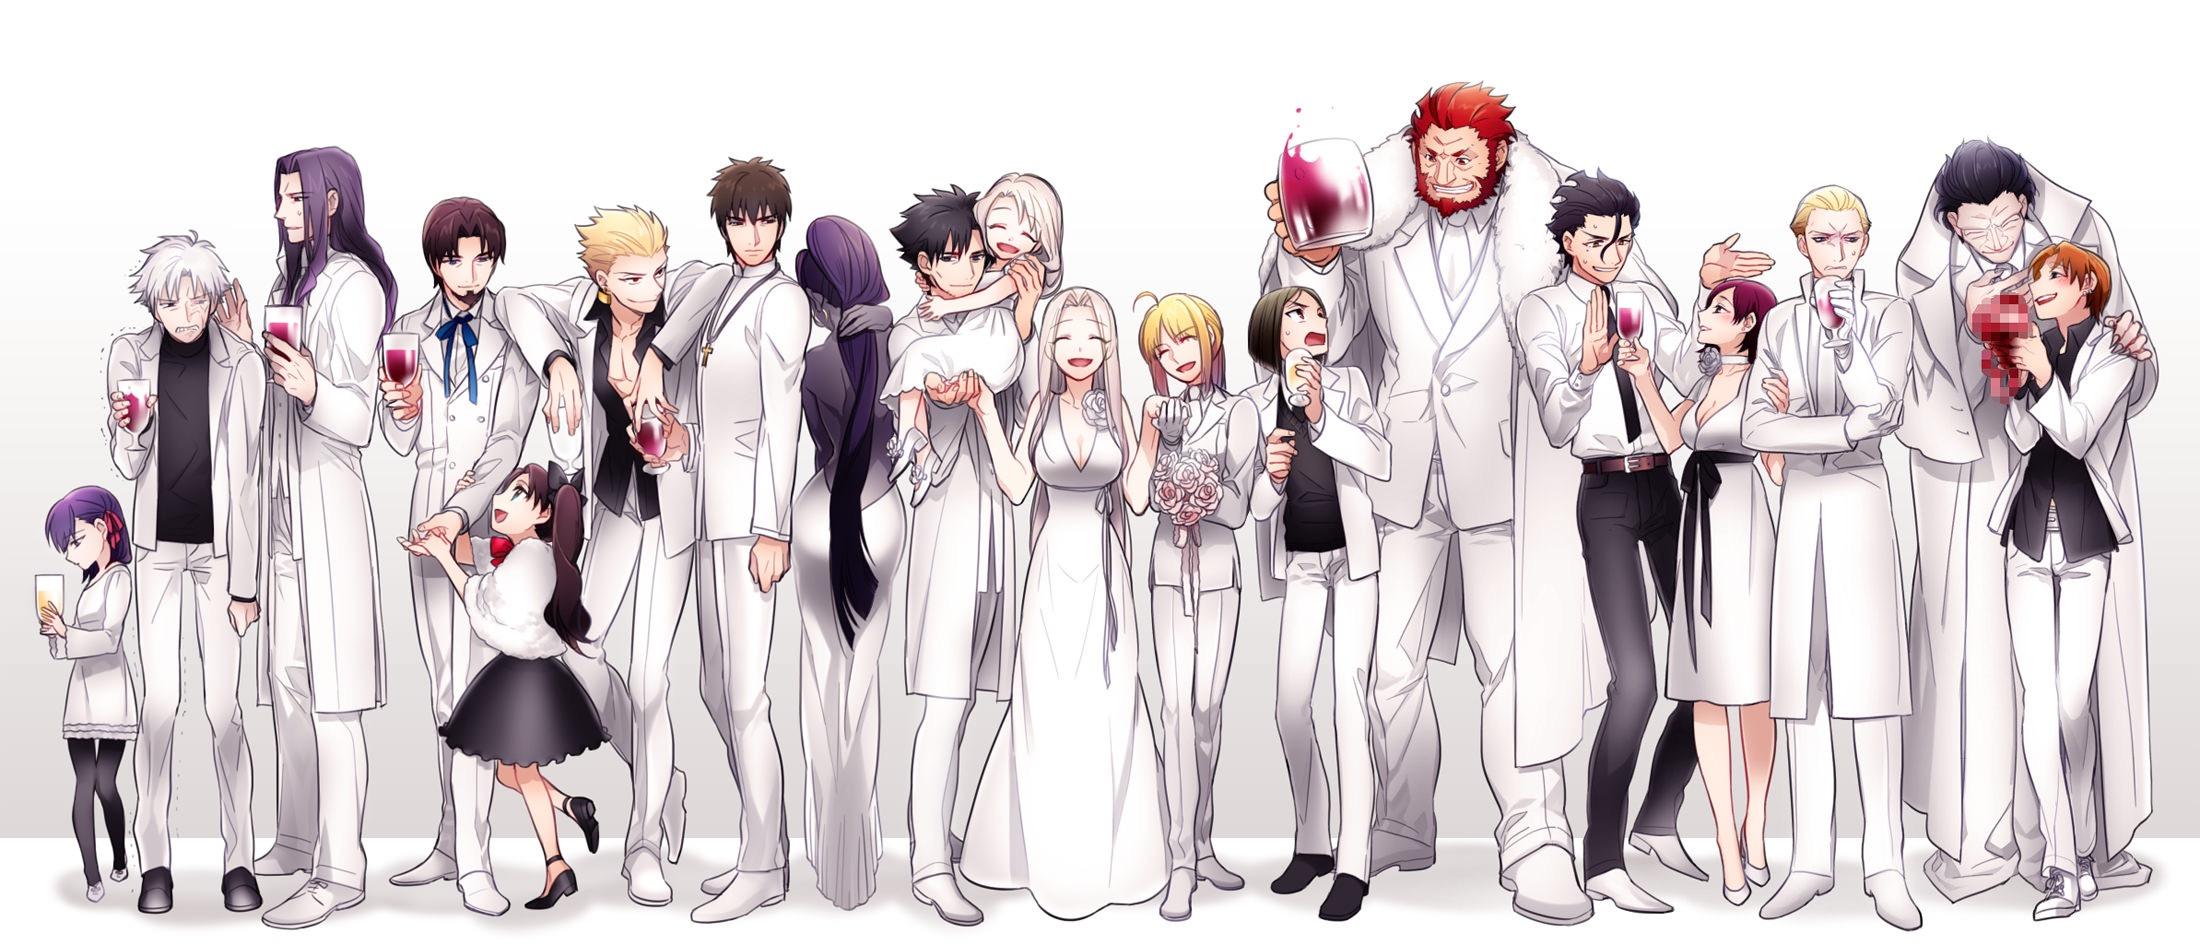 Fate/stay night (アニメ)の画像 p1_13